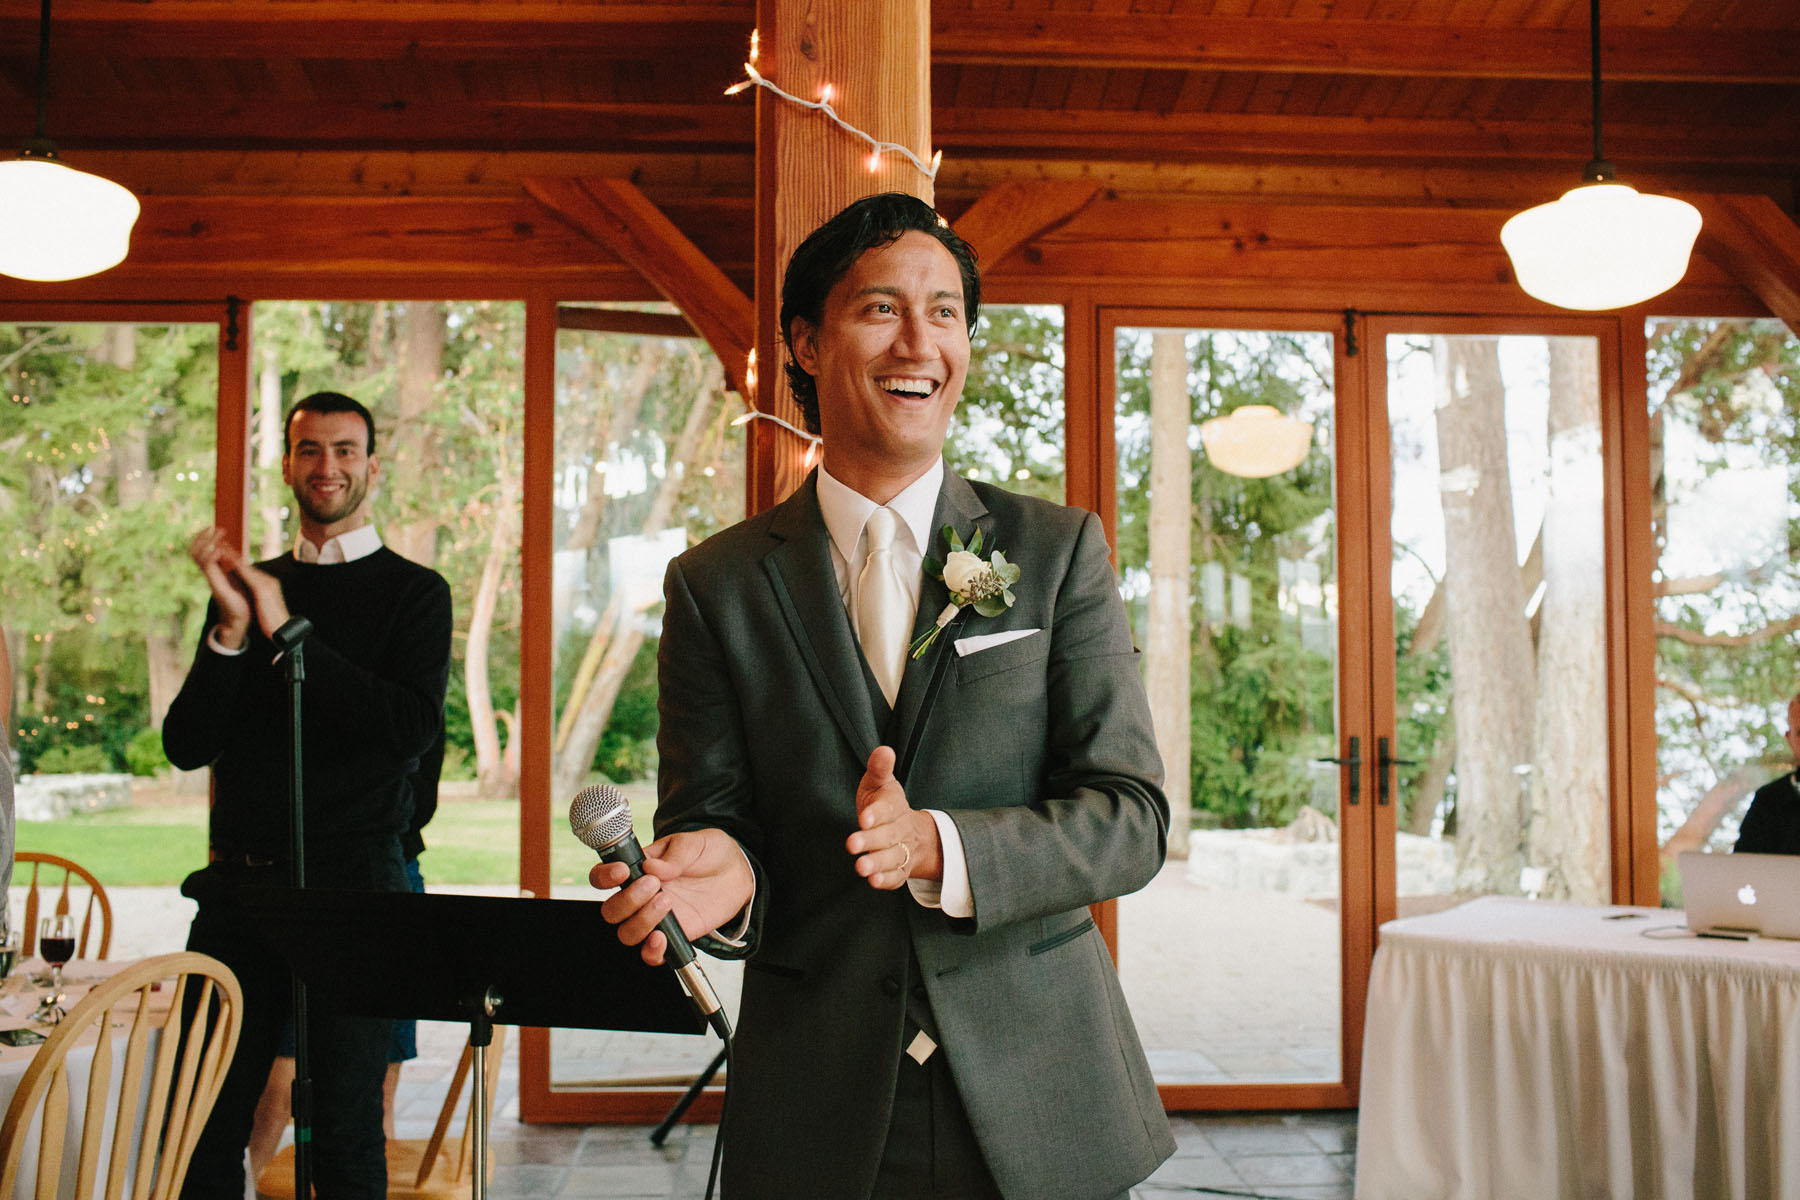 thetis-island-wedding-photographer-rp-rn-154.jpg